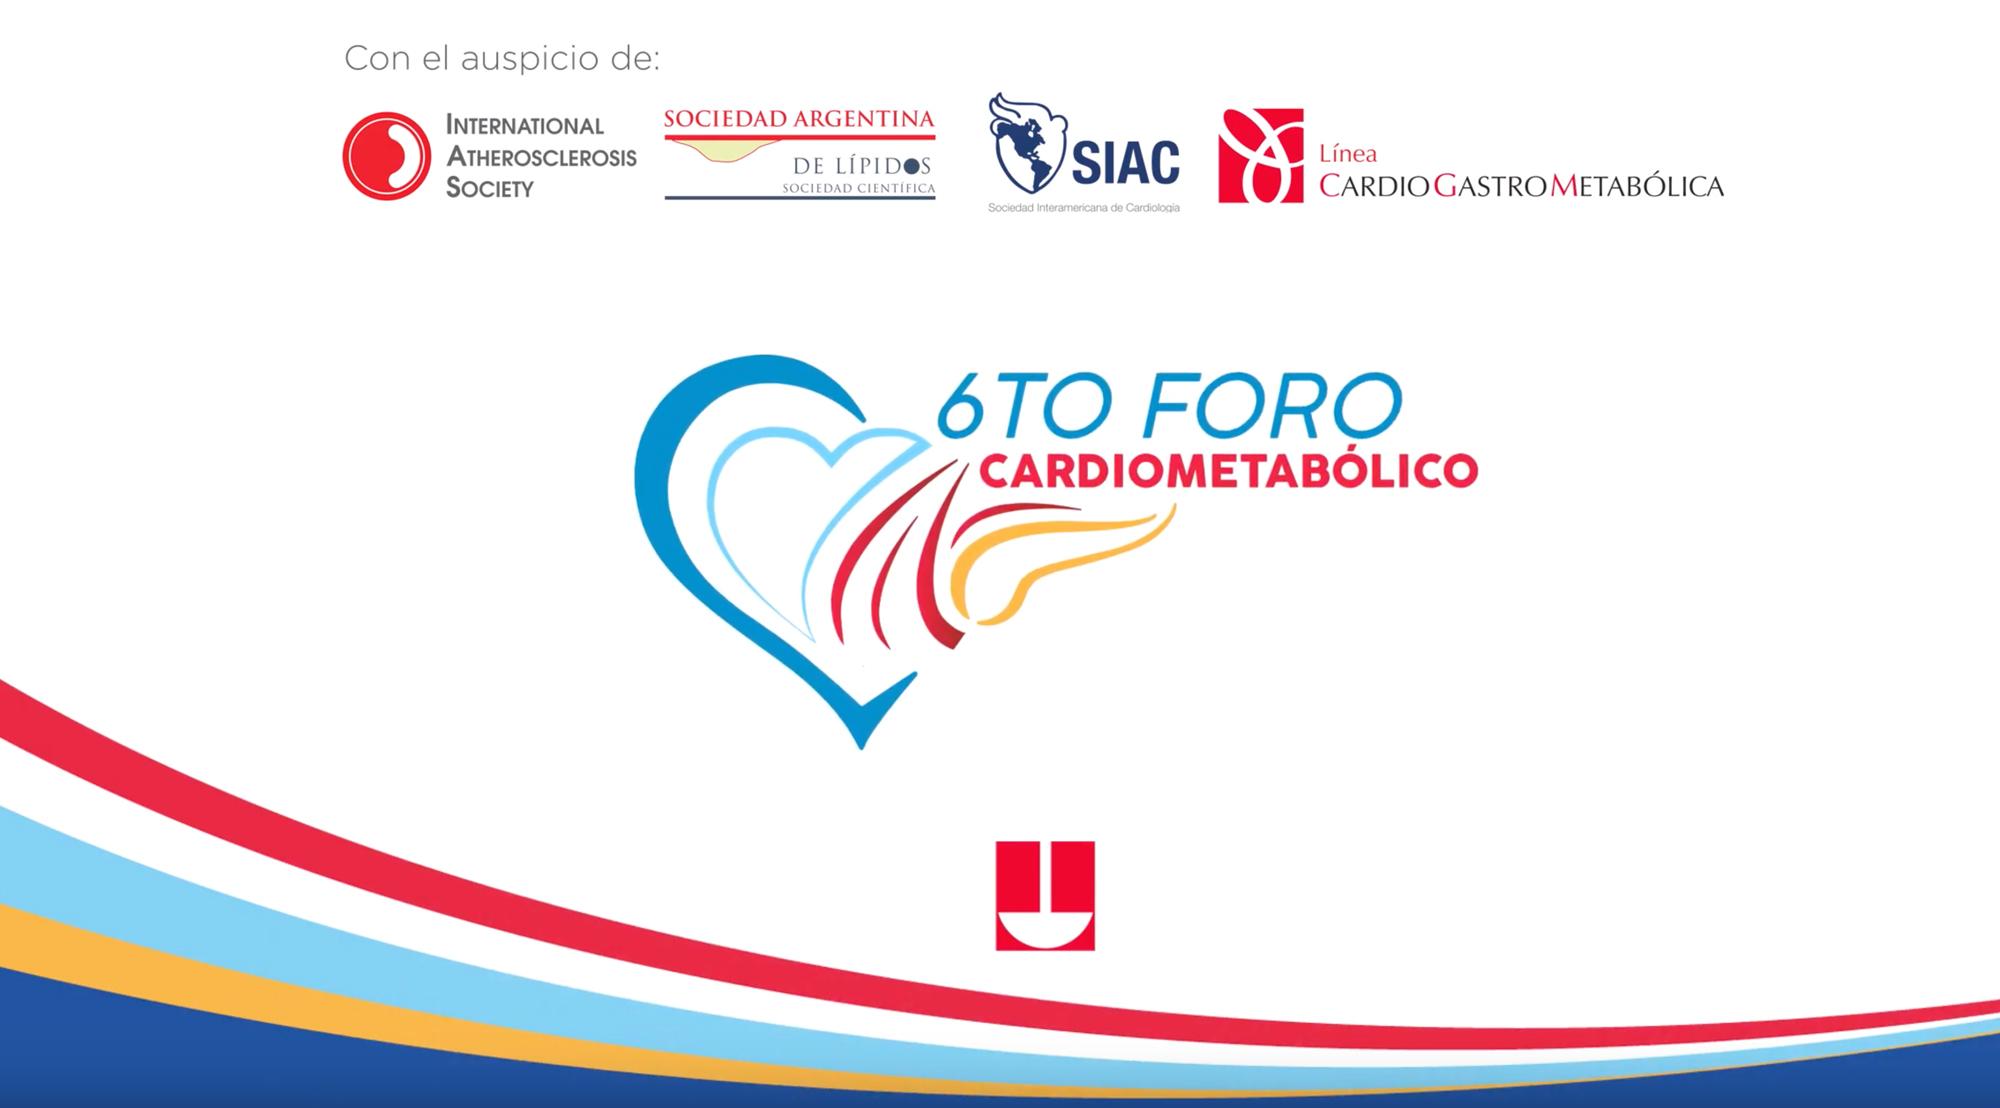 6to. Foro Cardiometabólico